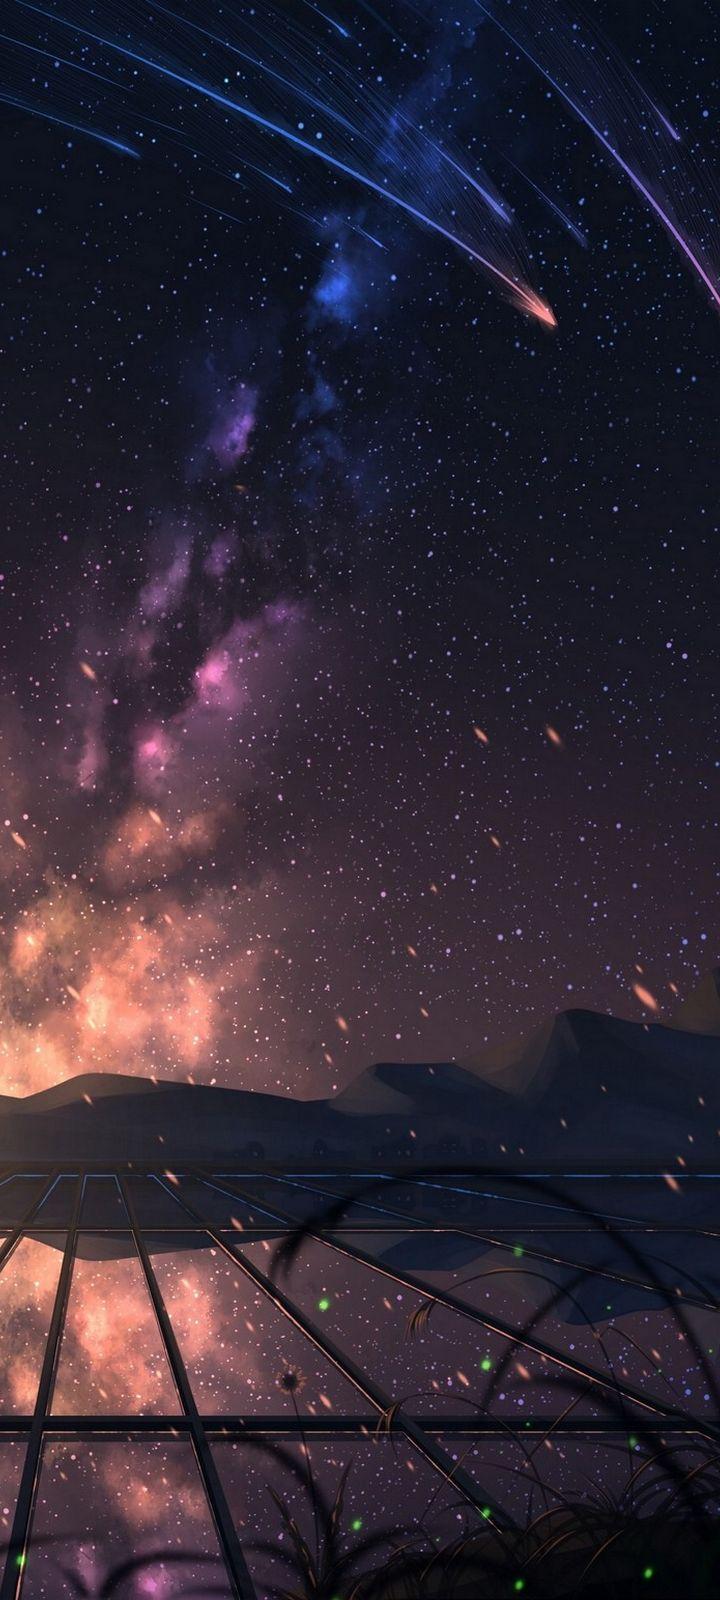 Starry Sky Stargazing Art Wallpaper 720x1600